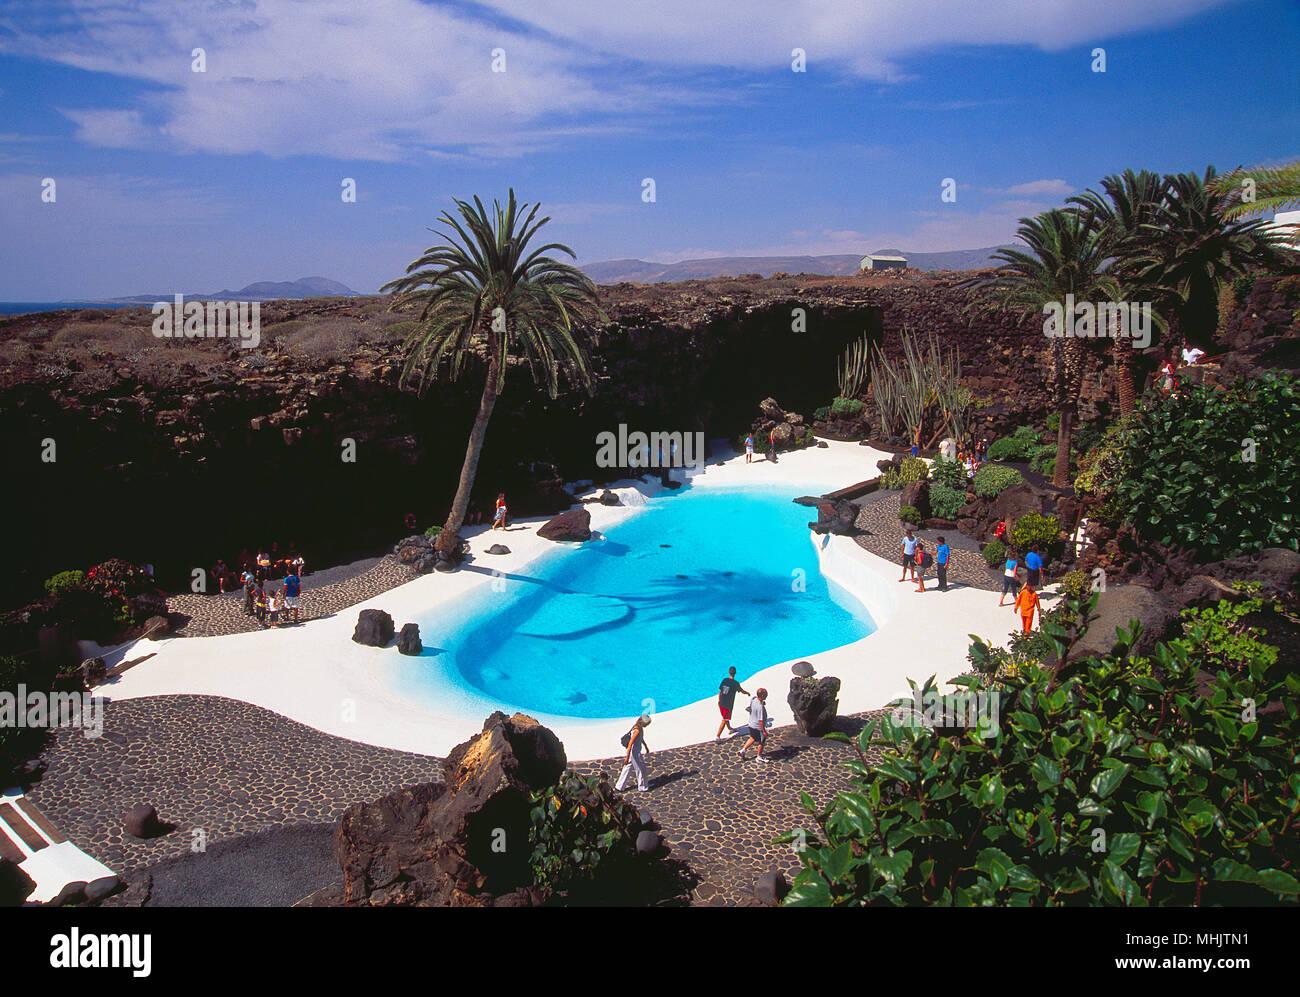 Jameos del Agua. Lanzarote, Kanarische Inseln, Spanien. Stockbild